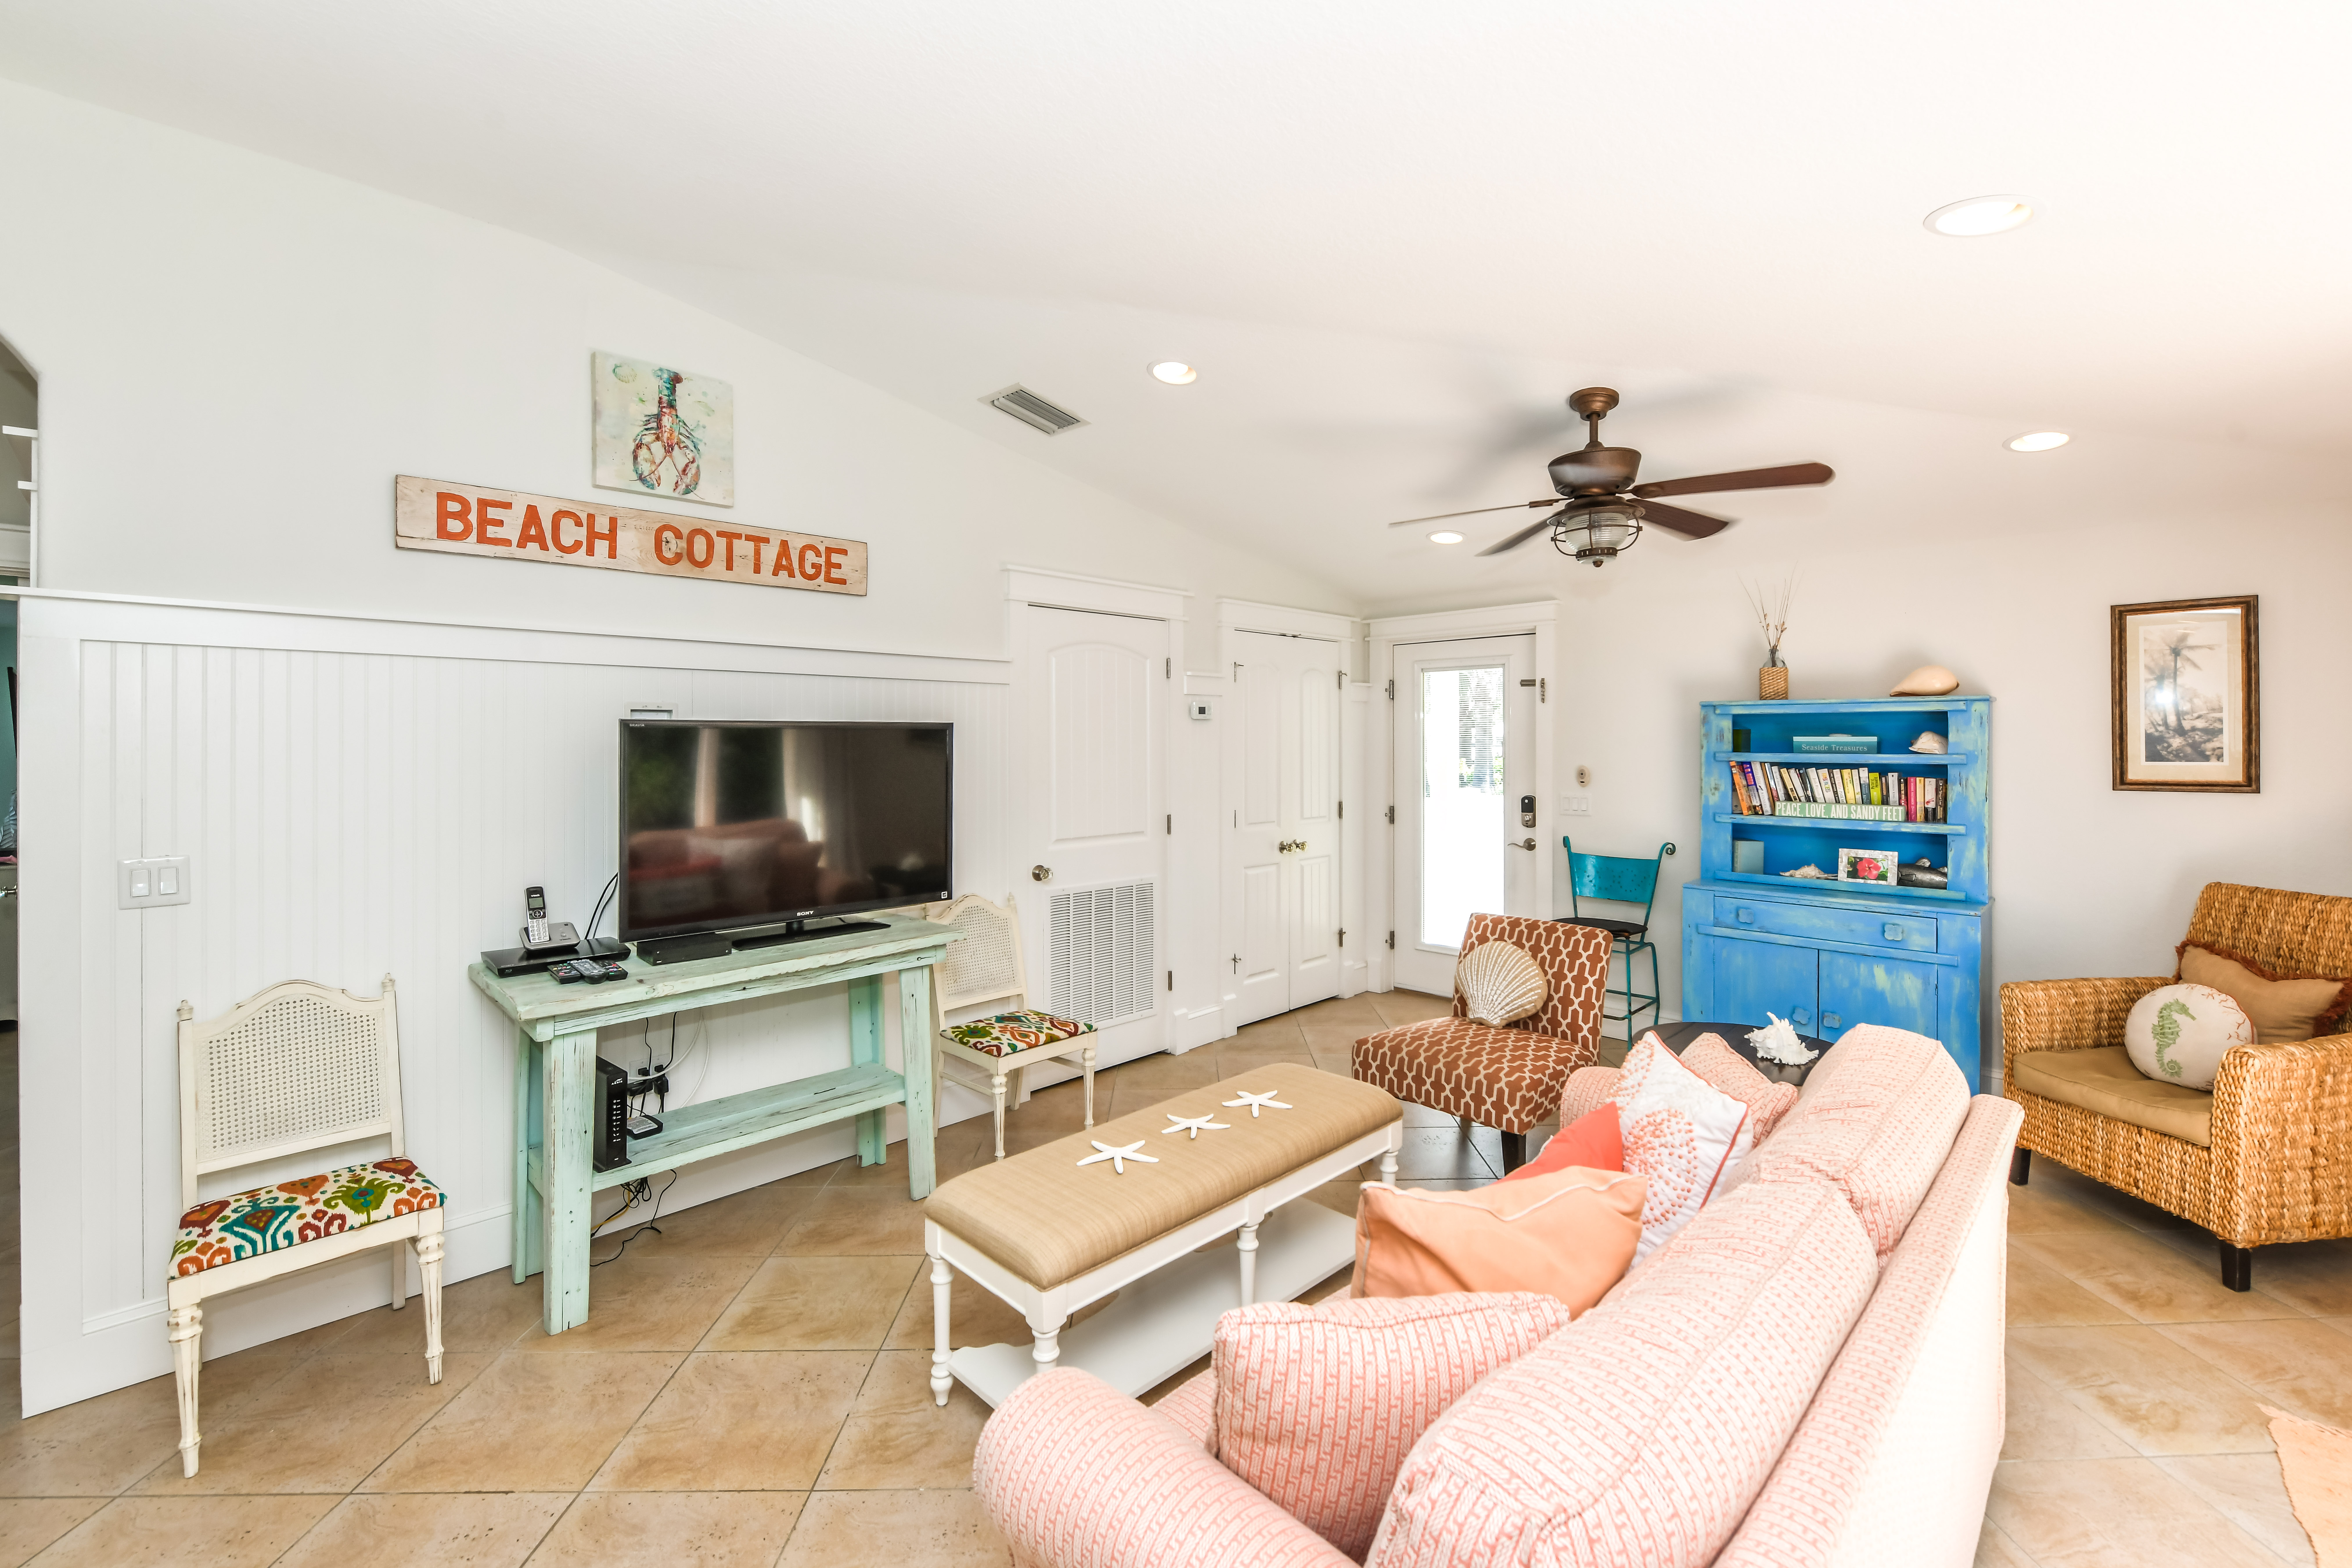 Coral Cottage - AMI Locals